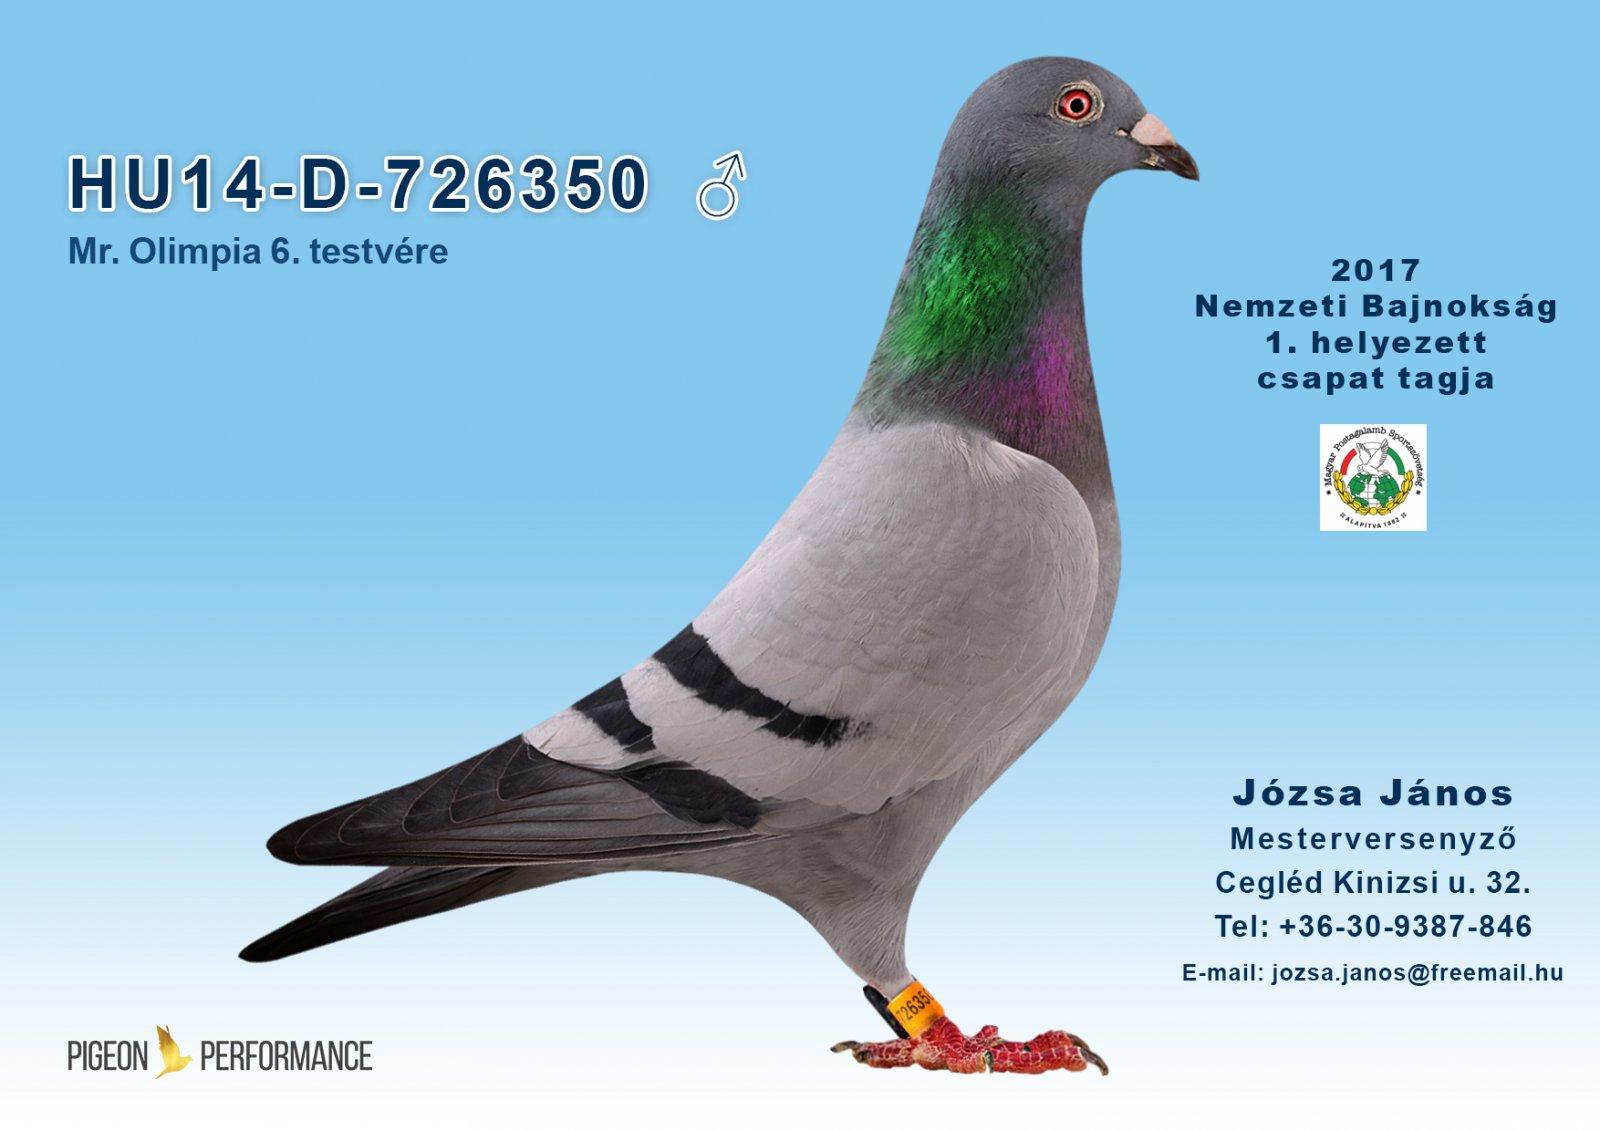 HU-2014-D-726350